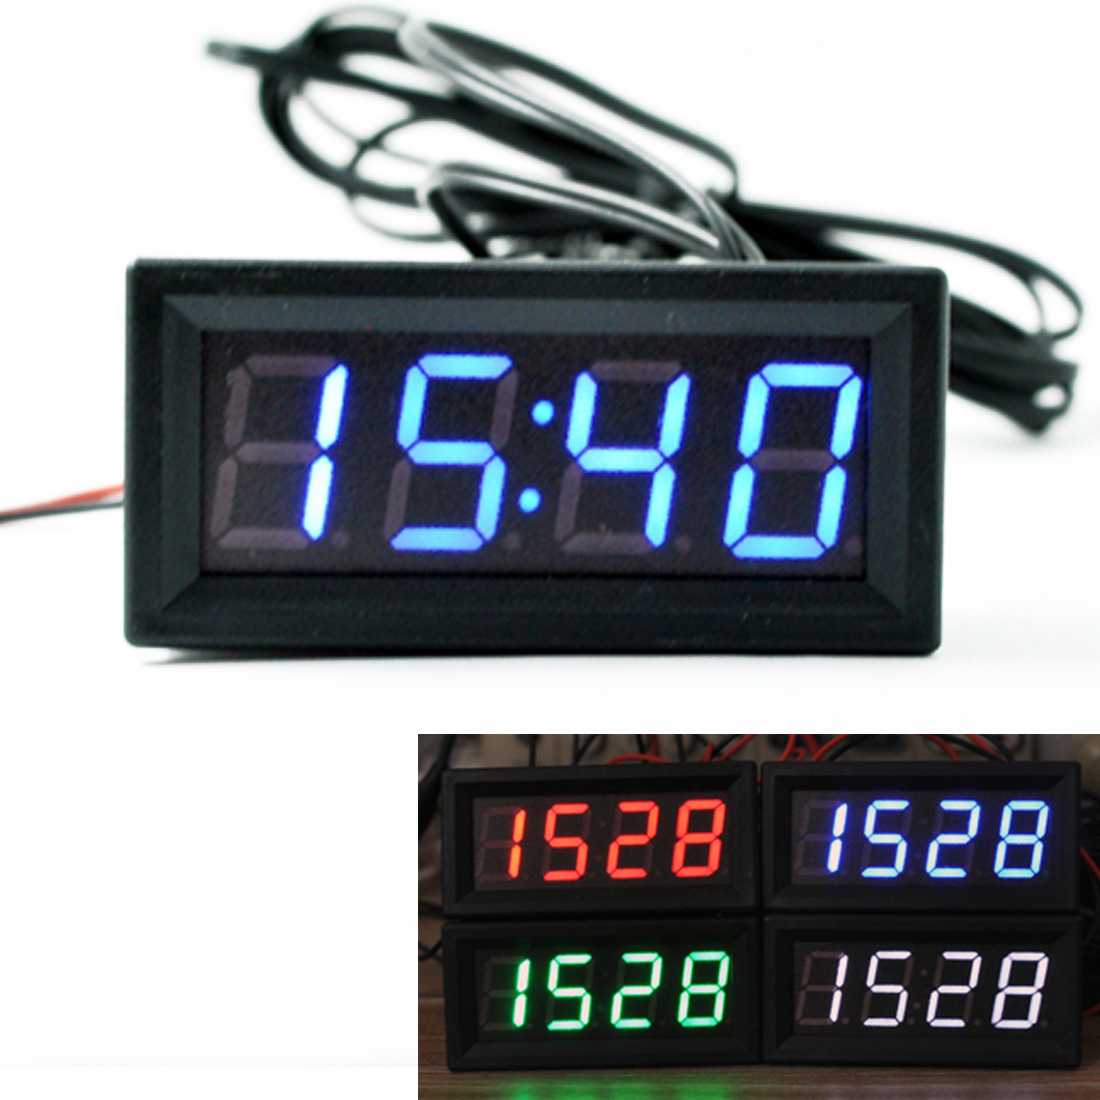 1bff73f44ba 3 EM 1 Display LCD Digital Medidor de Temperatura Termômetro Carro Relógio  Carro Ferramenta Detector Testador